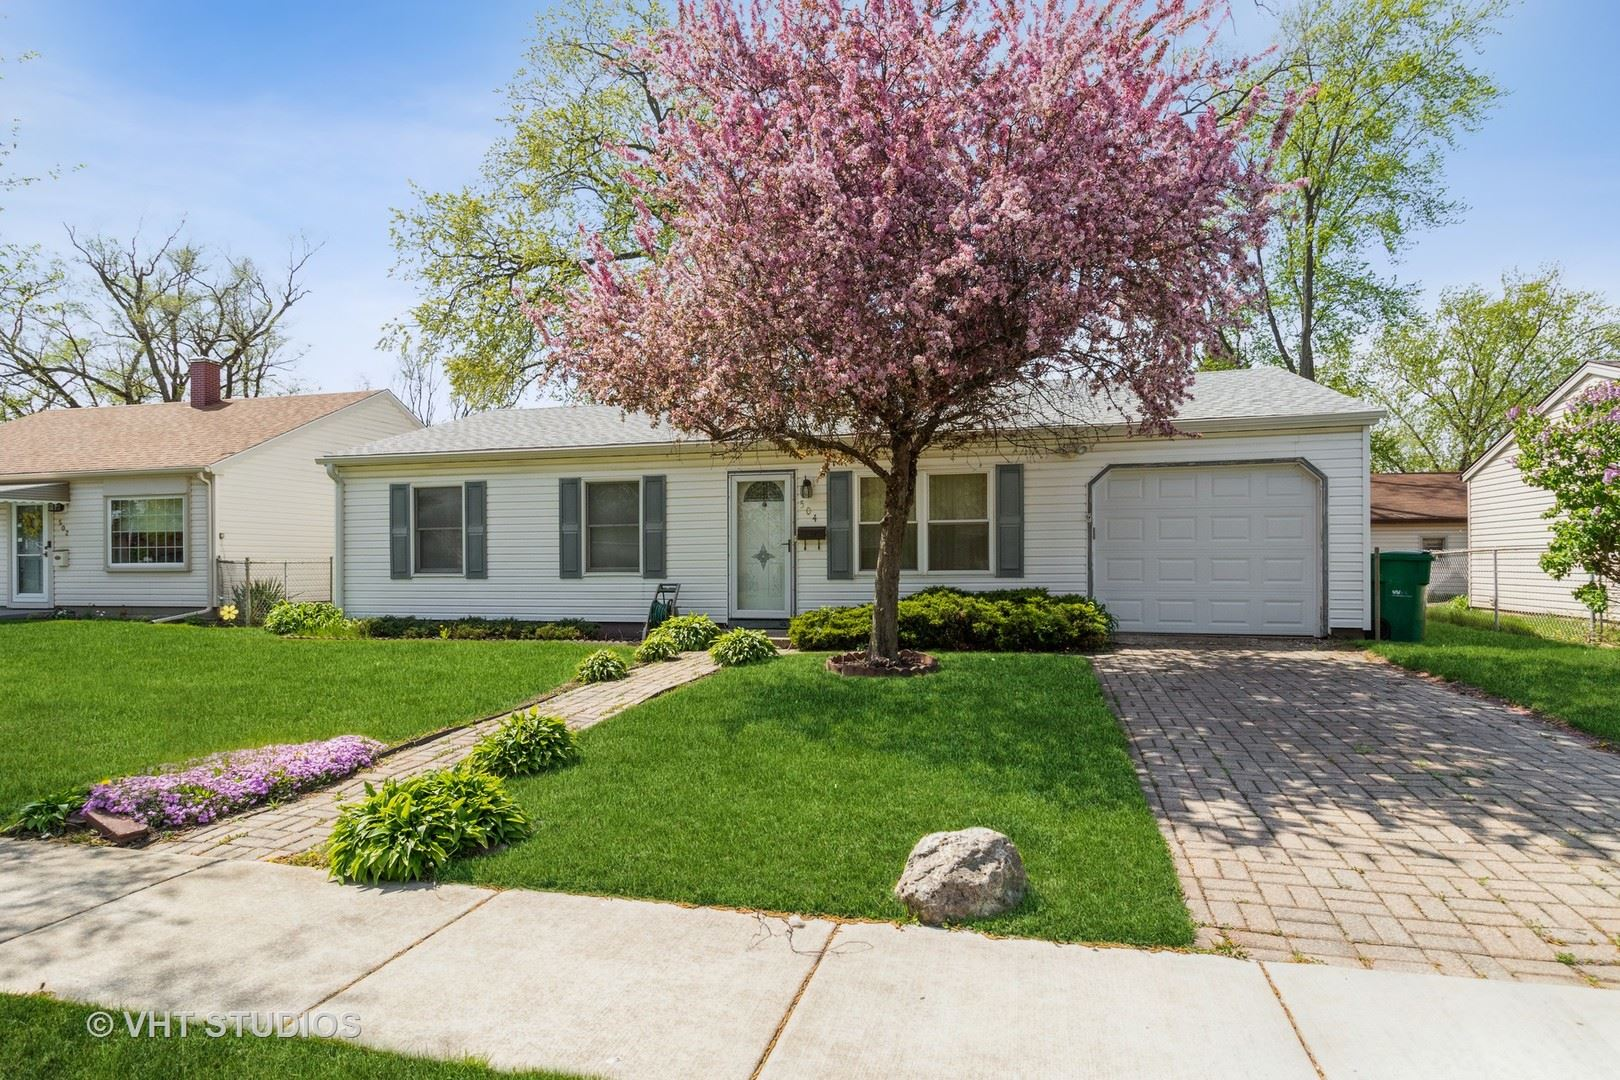 Photo of 504 Amherst Avenue, Romeoville, IL 60446 (MLS # 11068454)